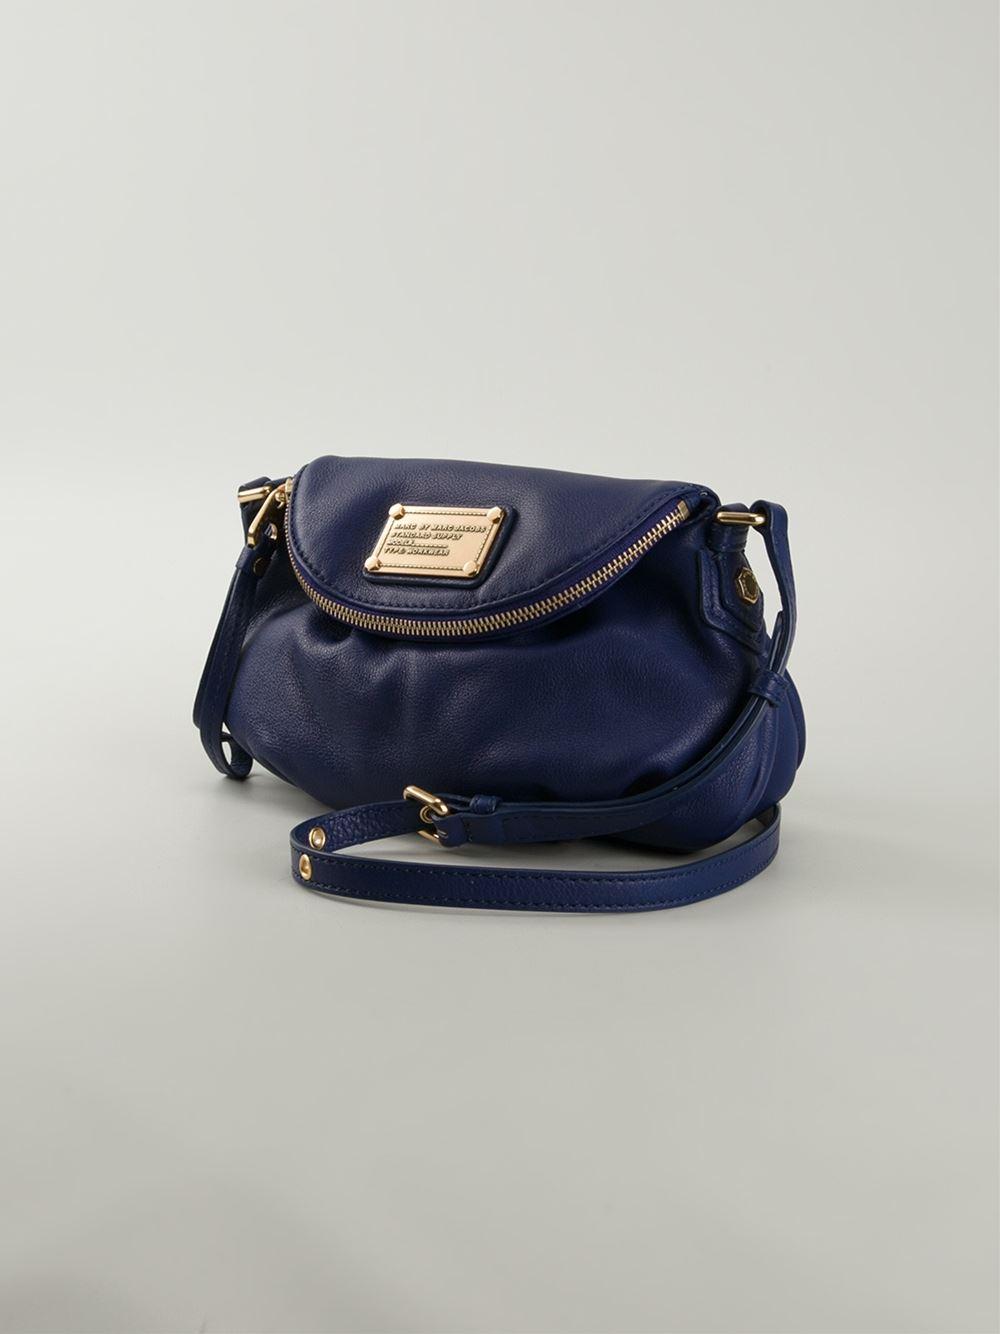 20ecaaff546 Marc By Marc Jacobs 'Classic Q Mini Natasha' Crossbody Bag in Blue ...